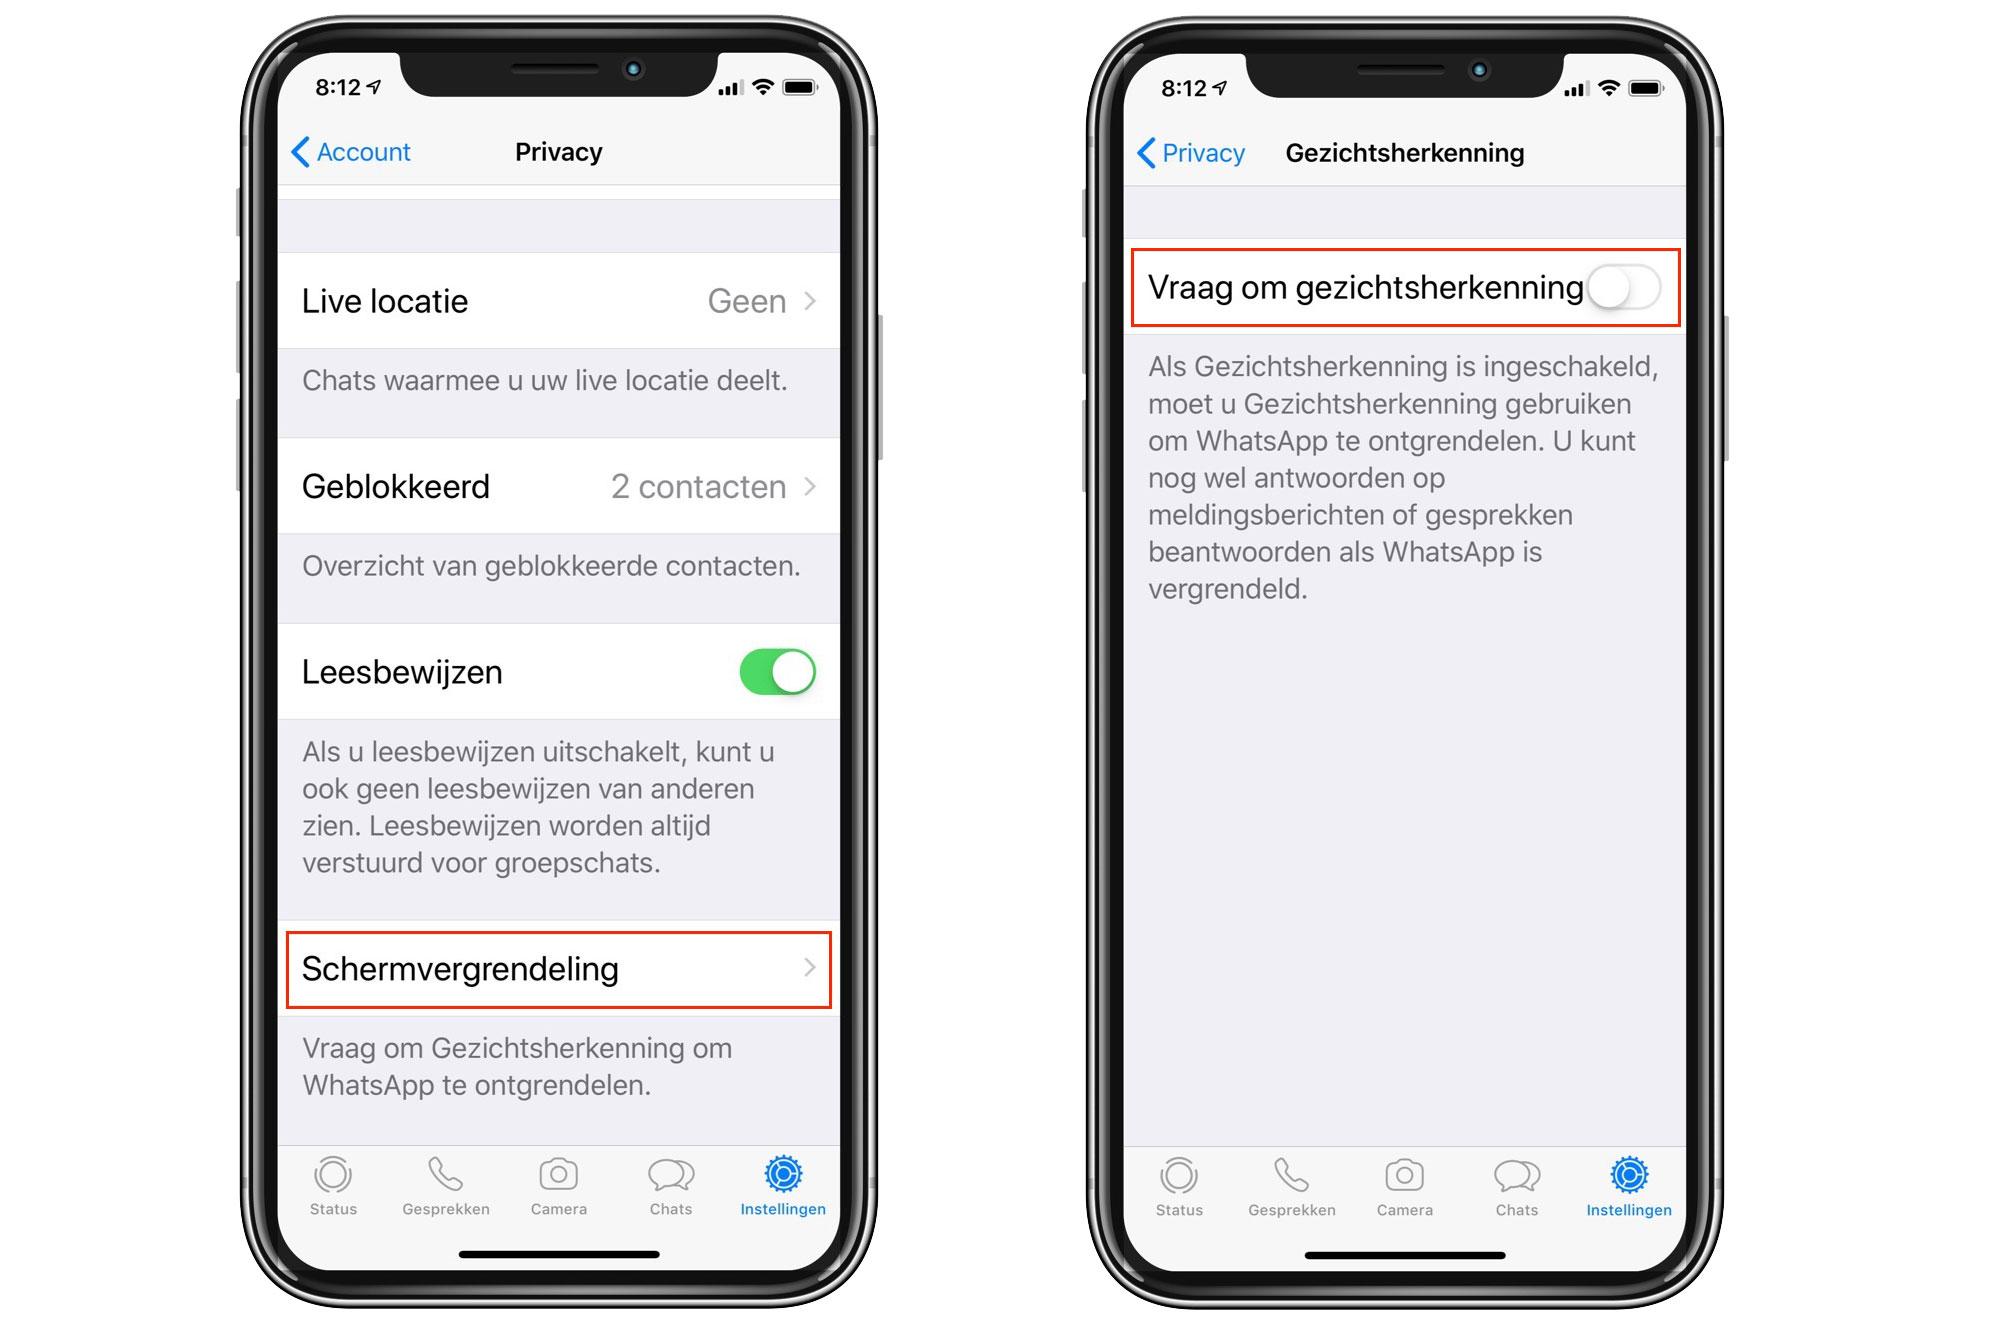 https://www.macfreak.nl/modules/news/images/zArt.WhatsAppFaceID-enTouchID-2.jpg